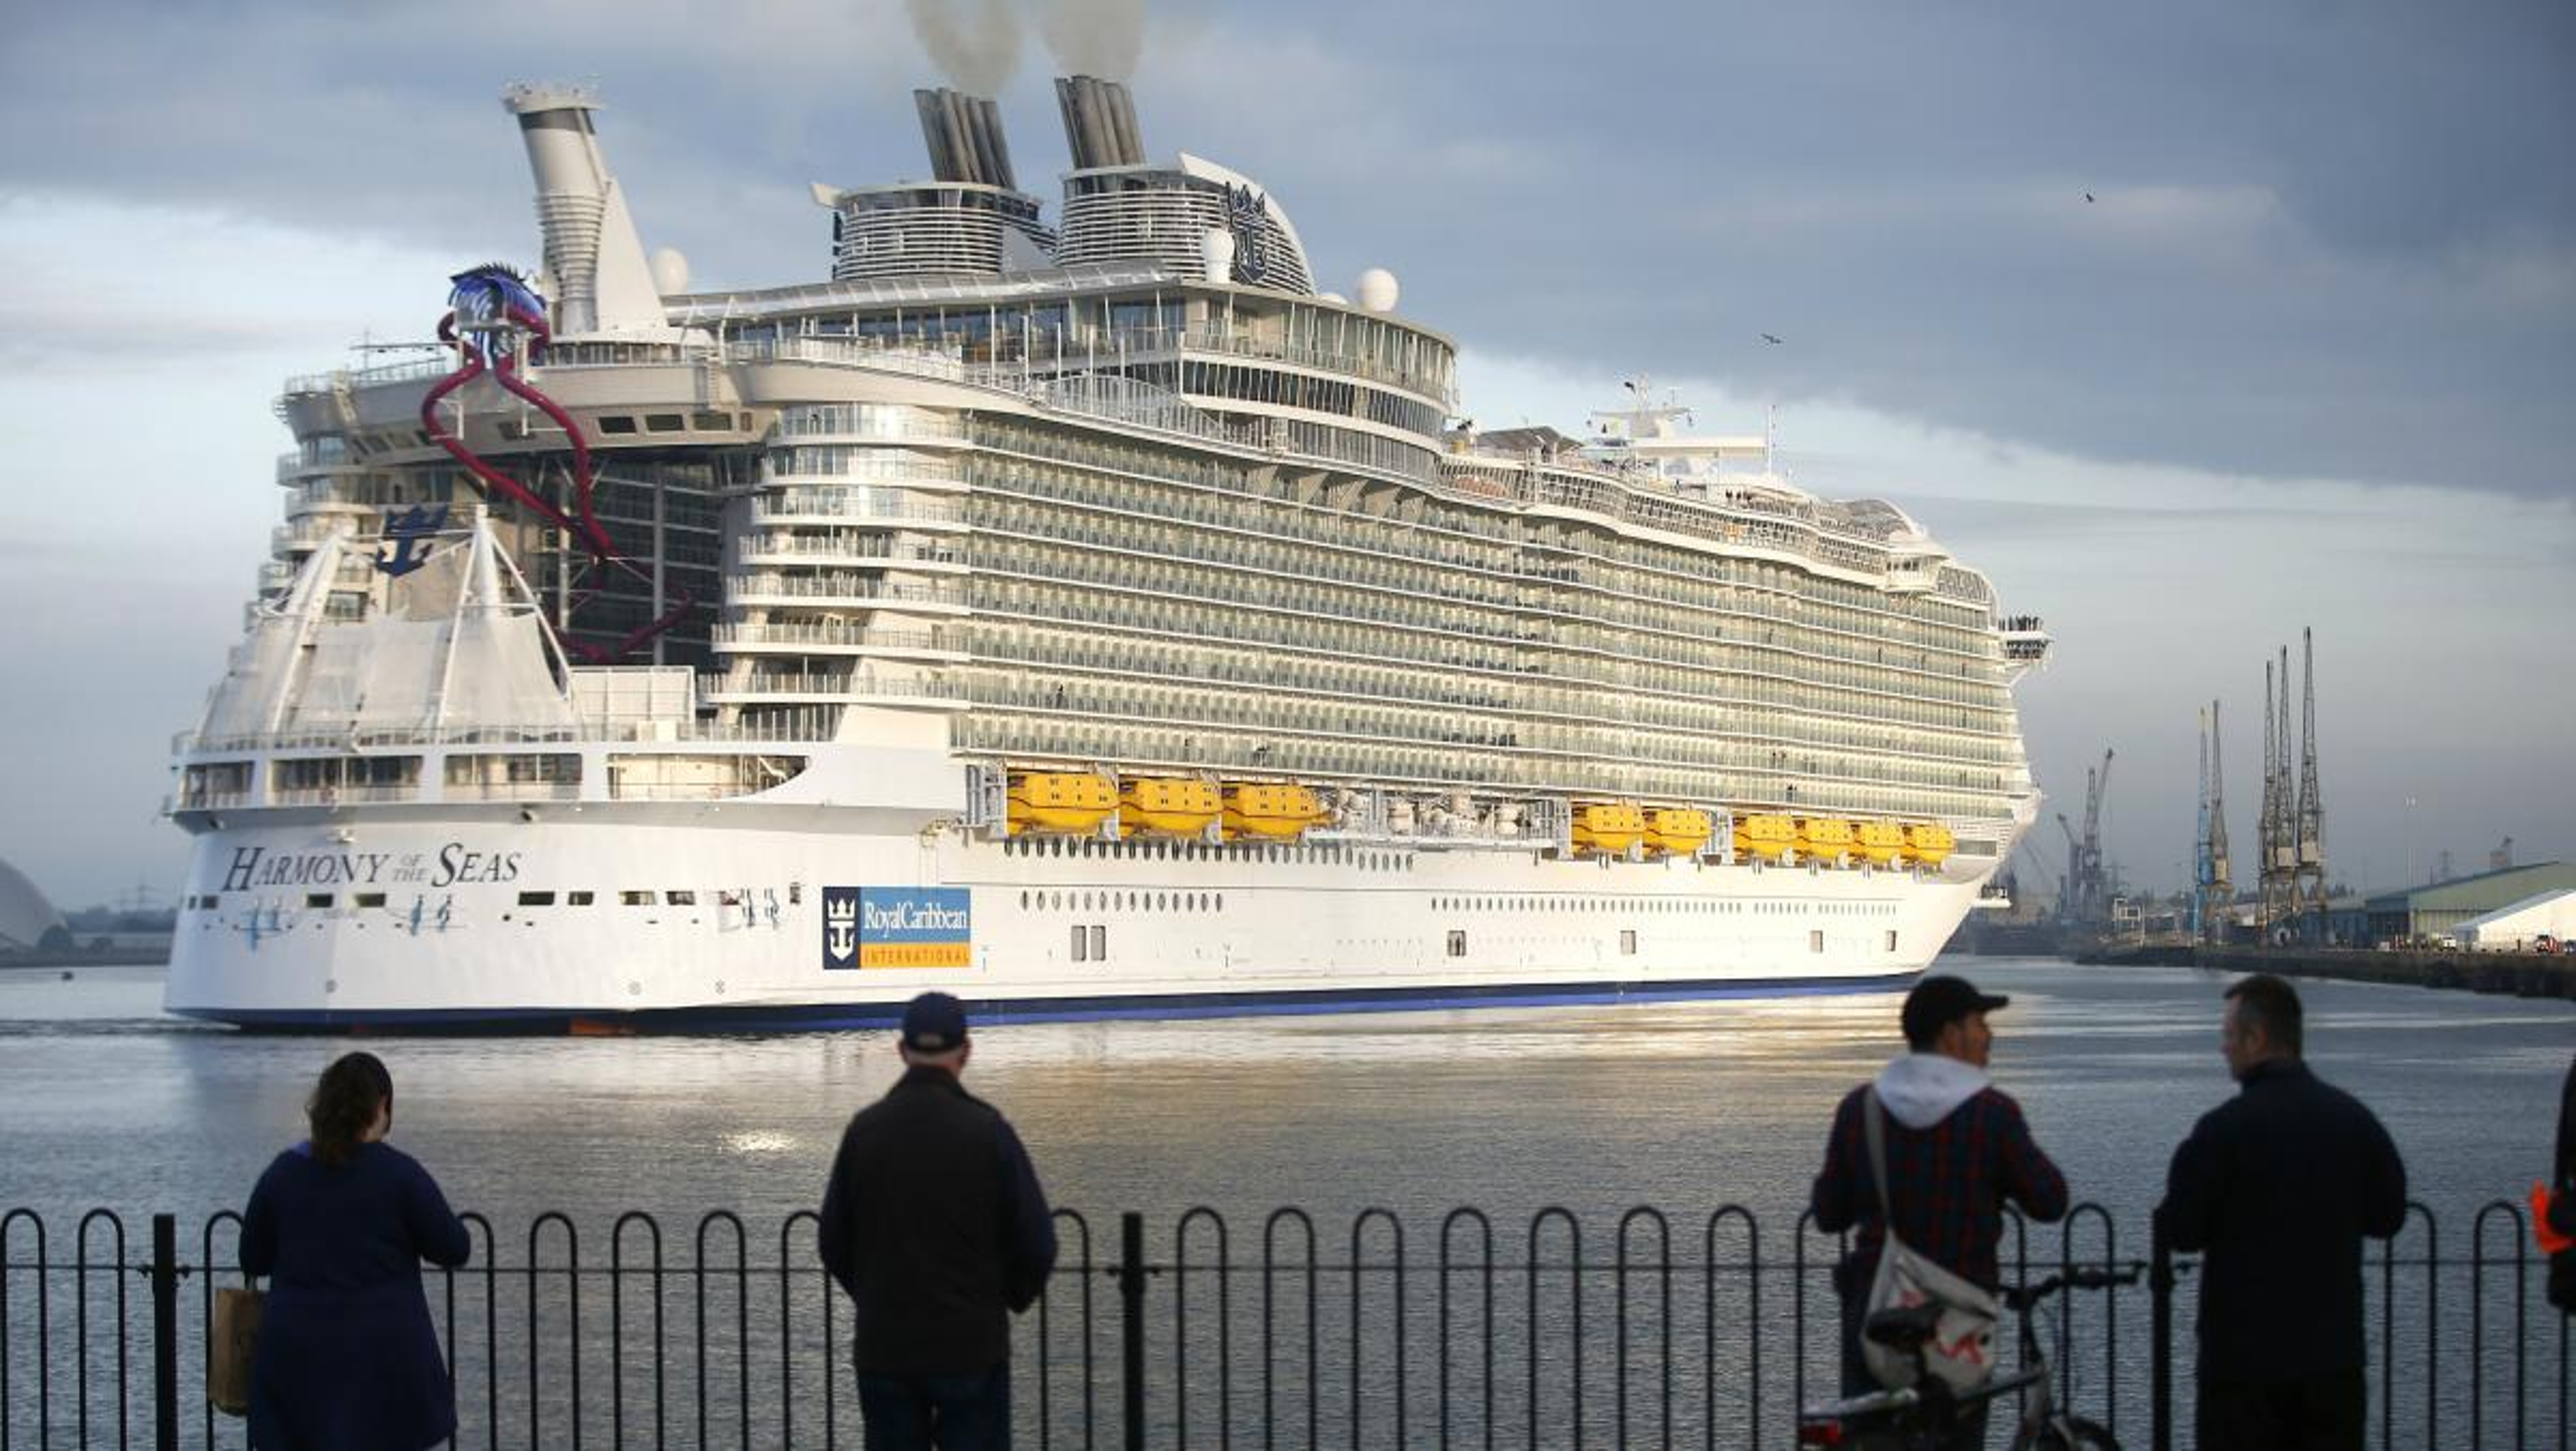 Cruise reality ship show 'Below Deck'